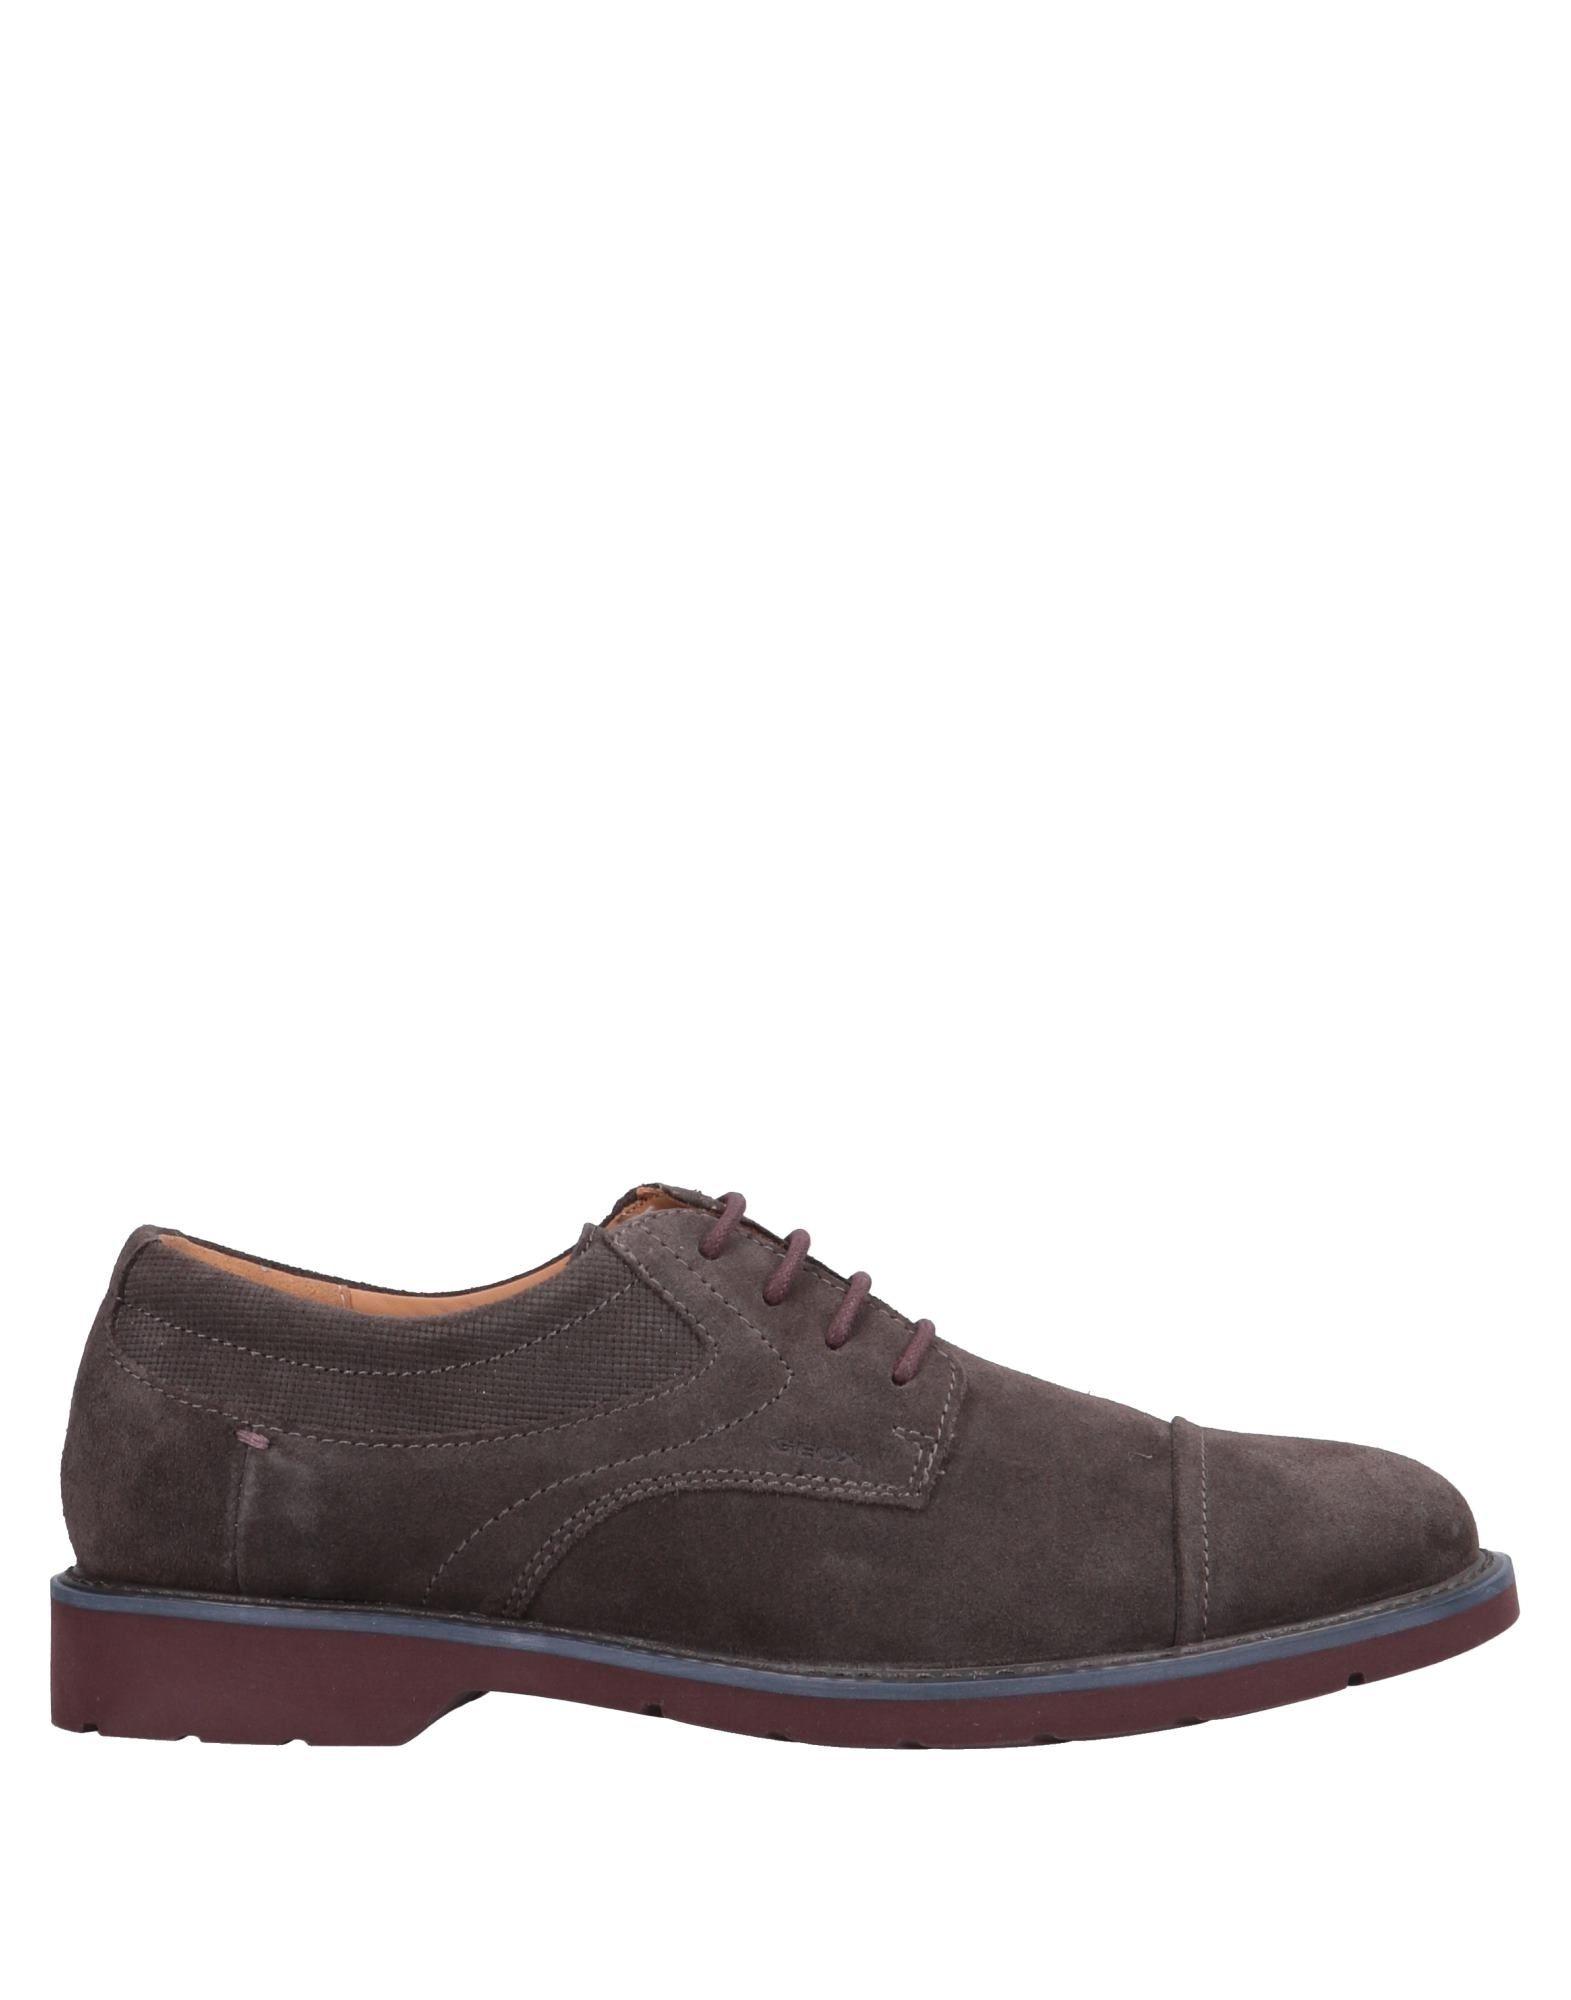 Rabatt echte Schuhe Geox Schnürschuhe Herren  11564802WH